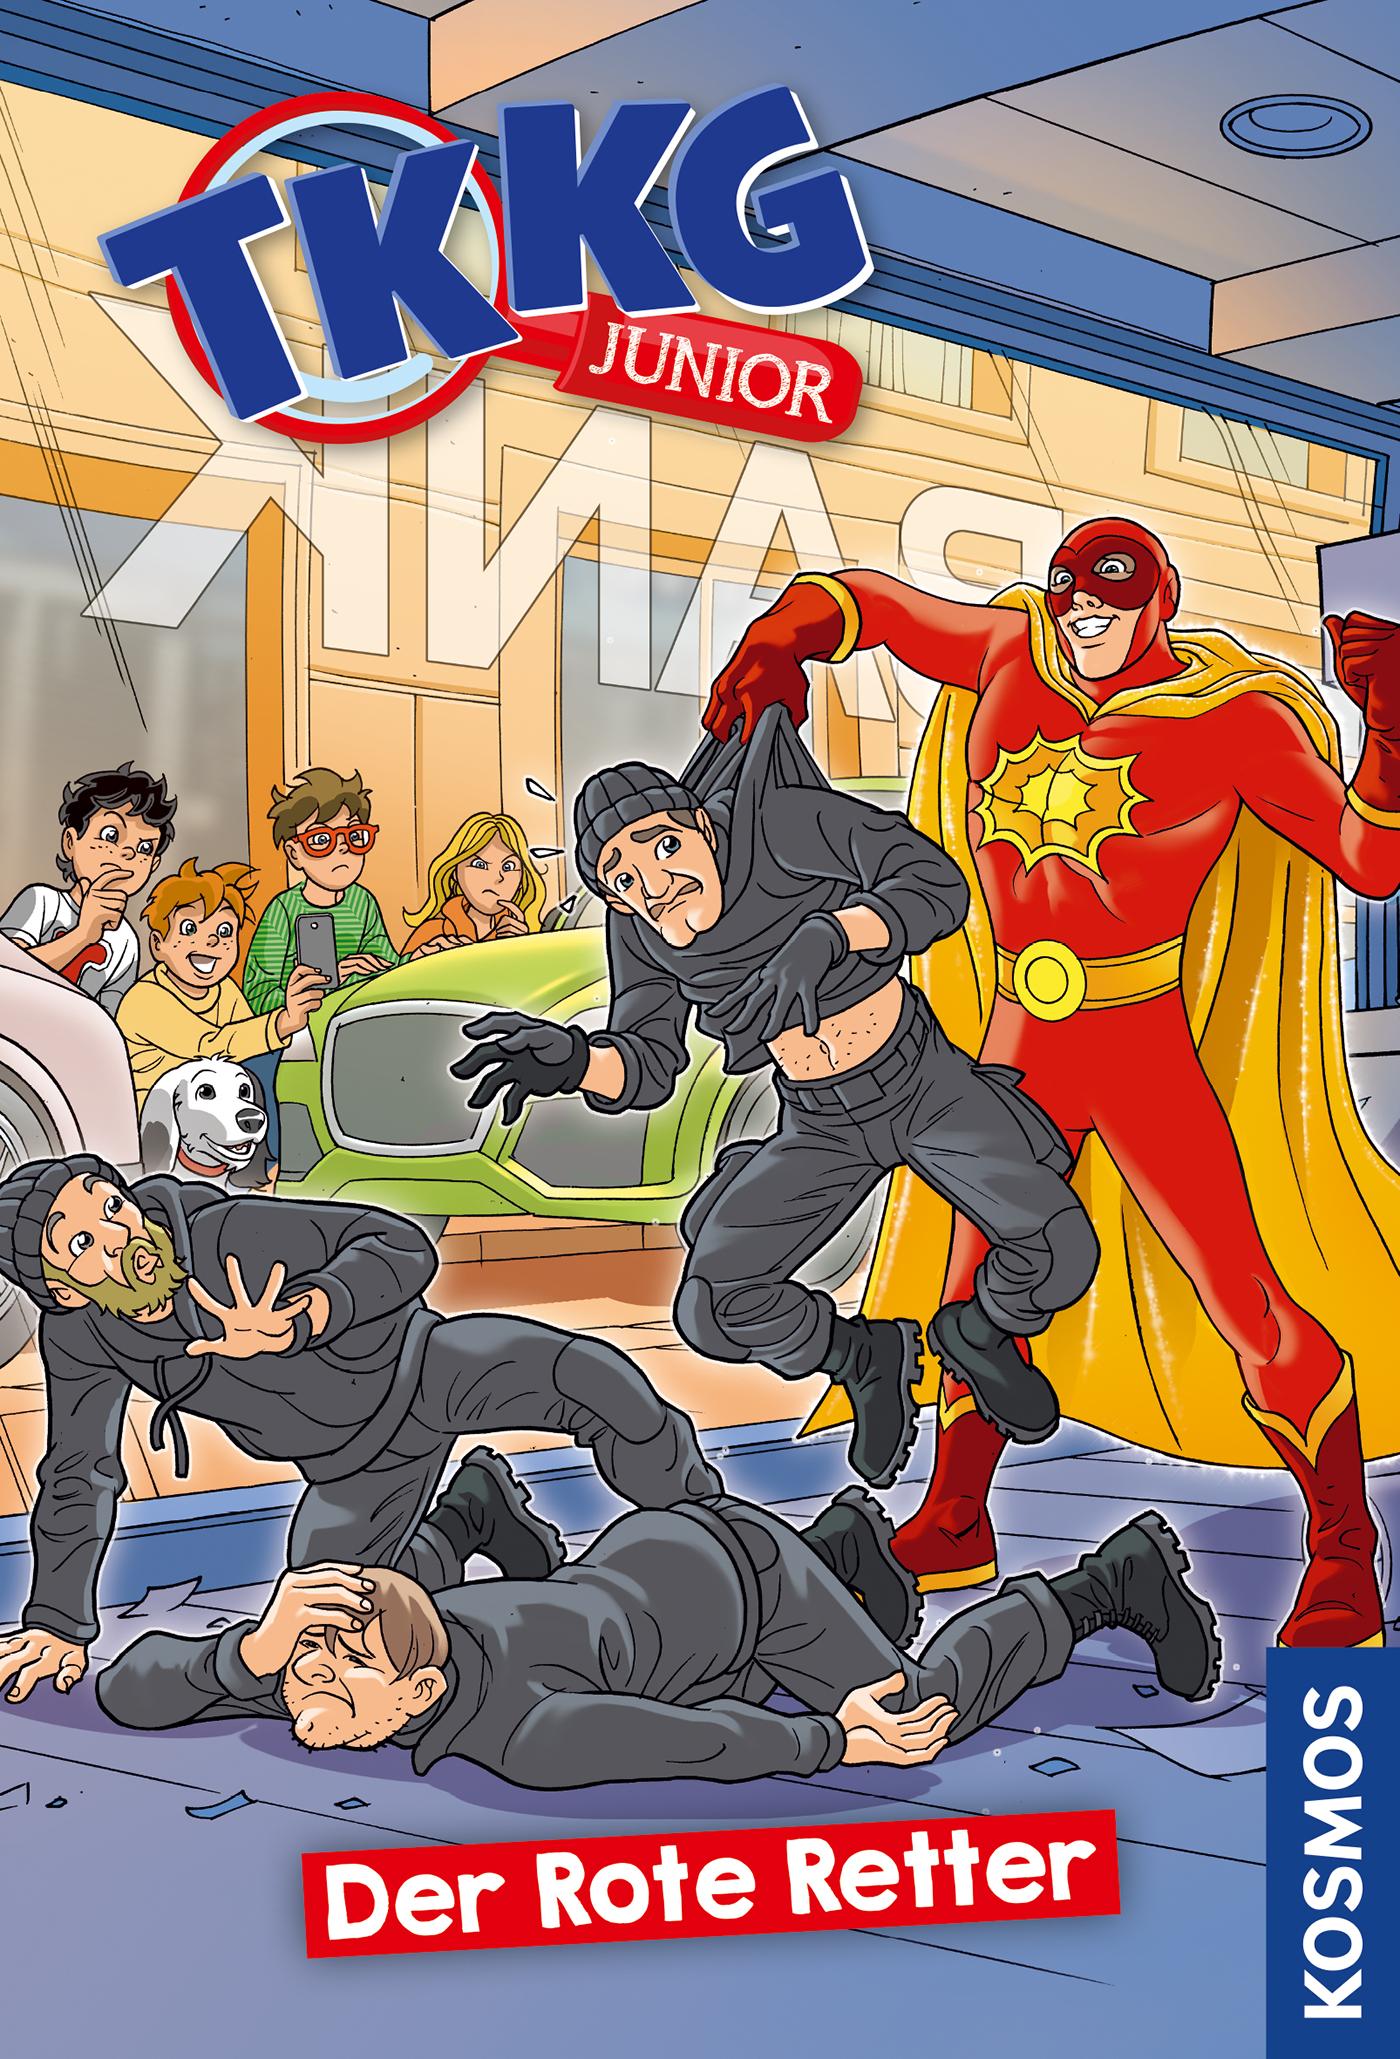 Cover Der Rote Retter Reihe TKKG Junior Bd. 4